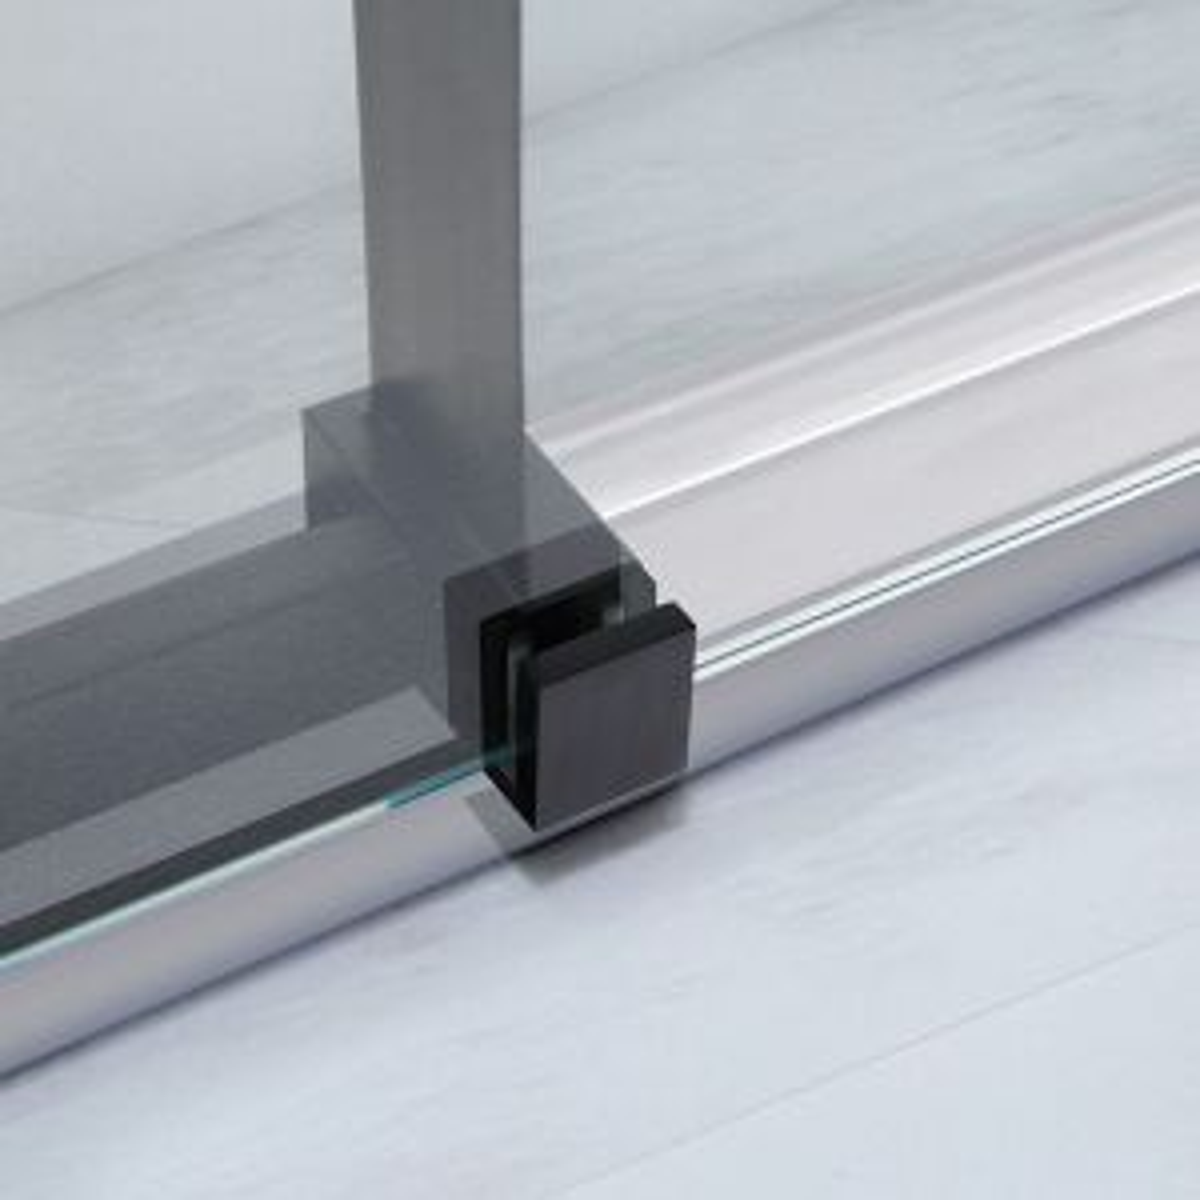 Frontline Aquaglass Onyx Black Sliding Shower Enclosure Roller